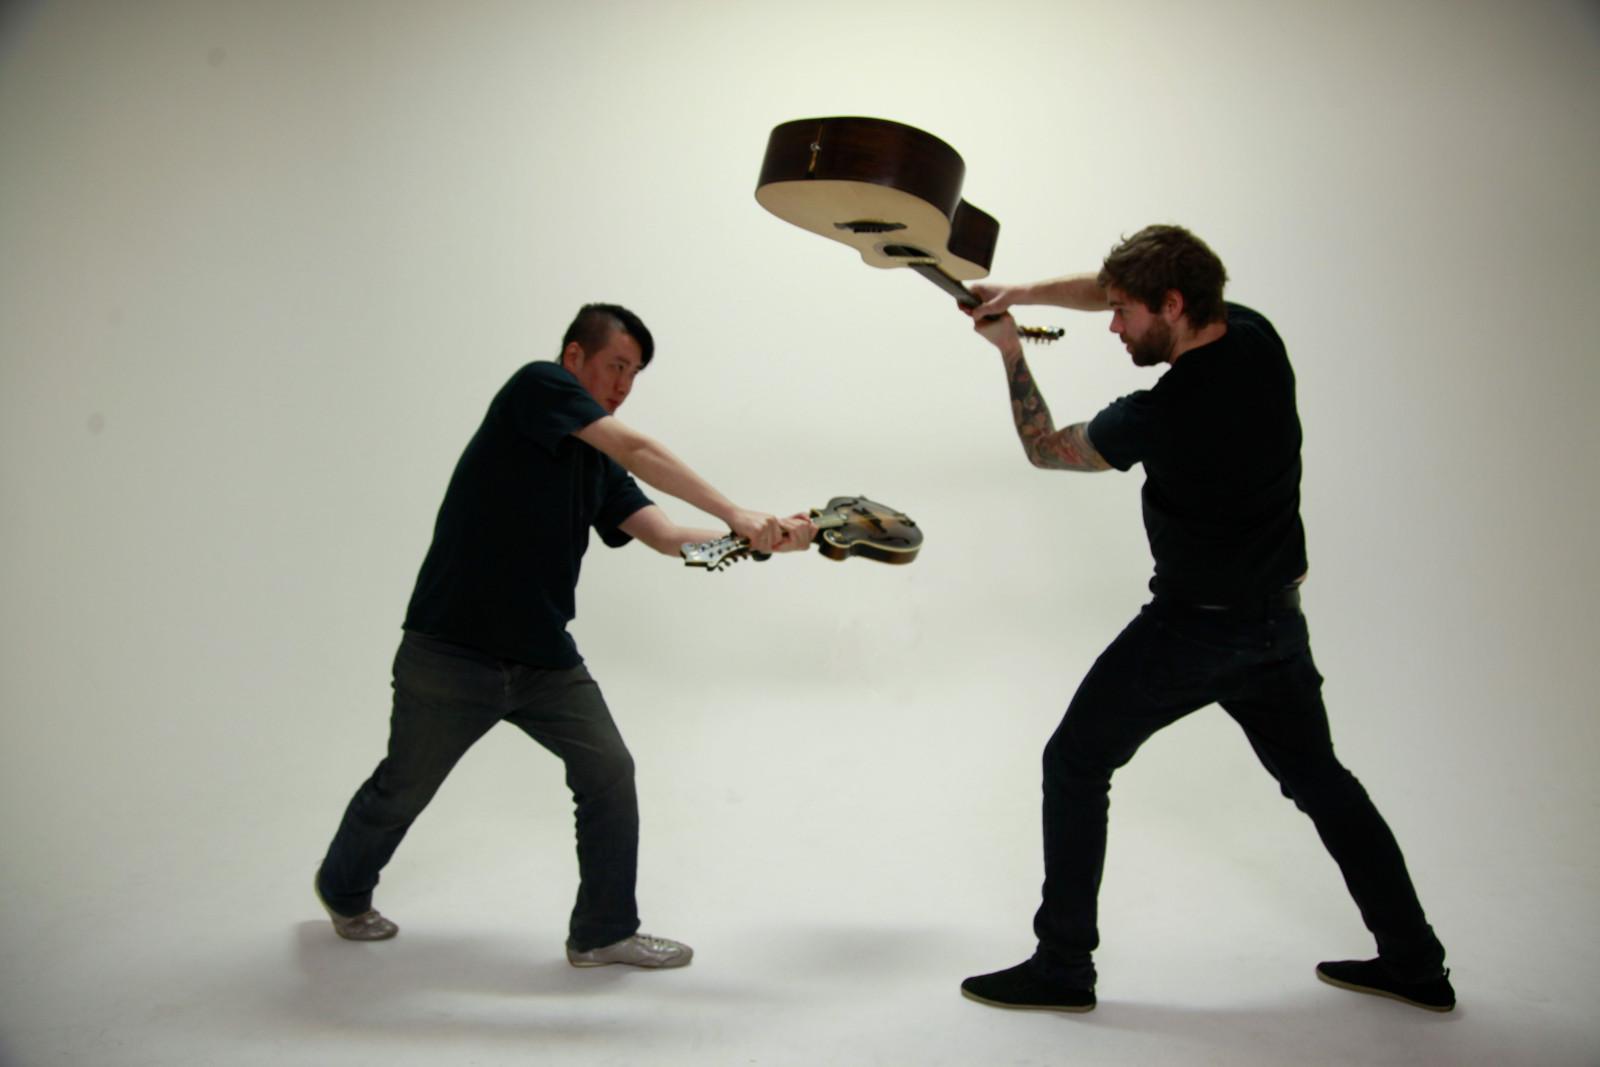 Jordan McConnell & Taro Inoue